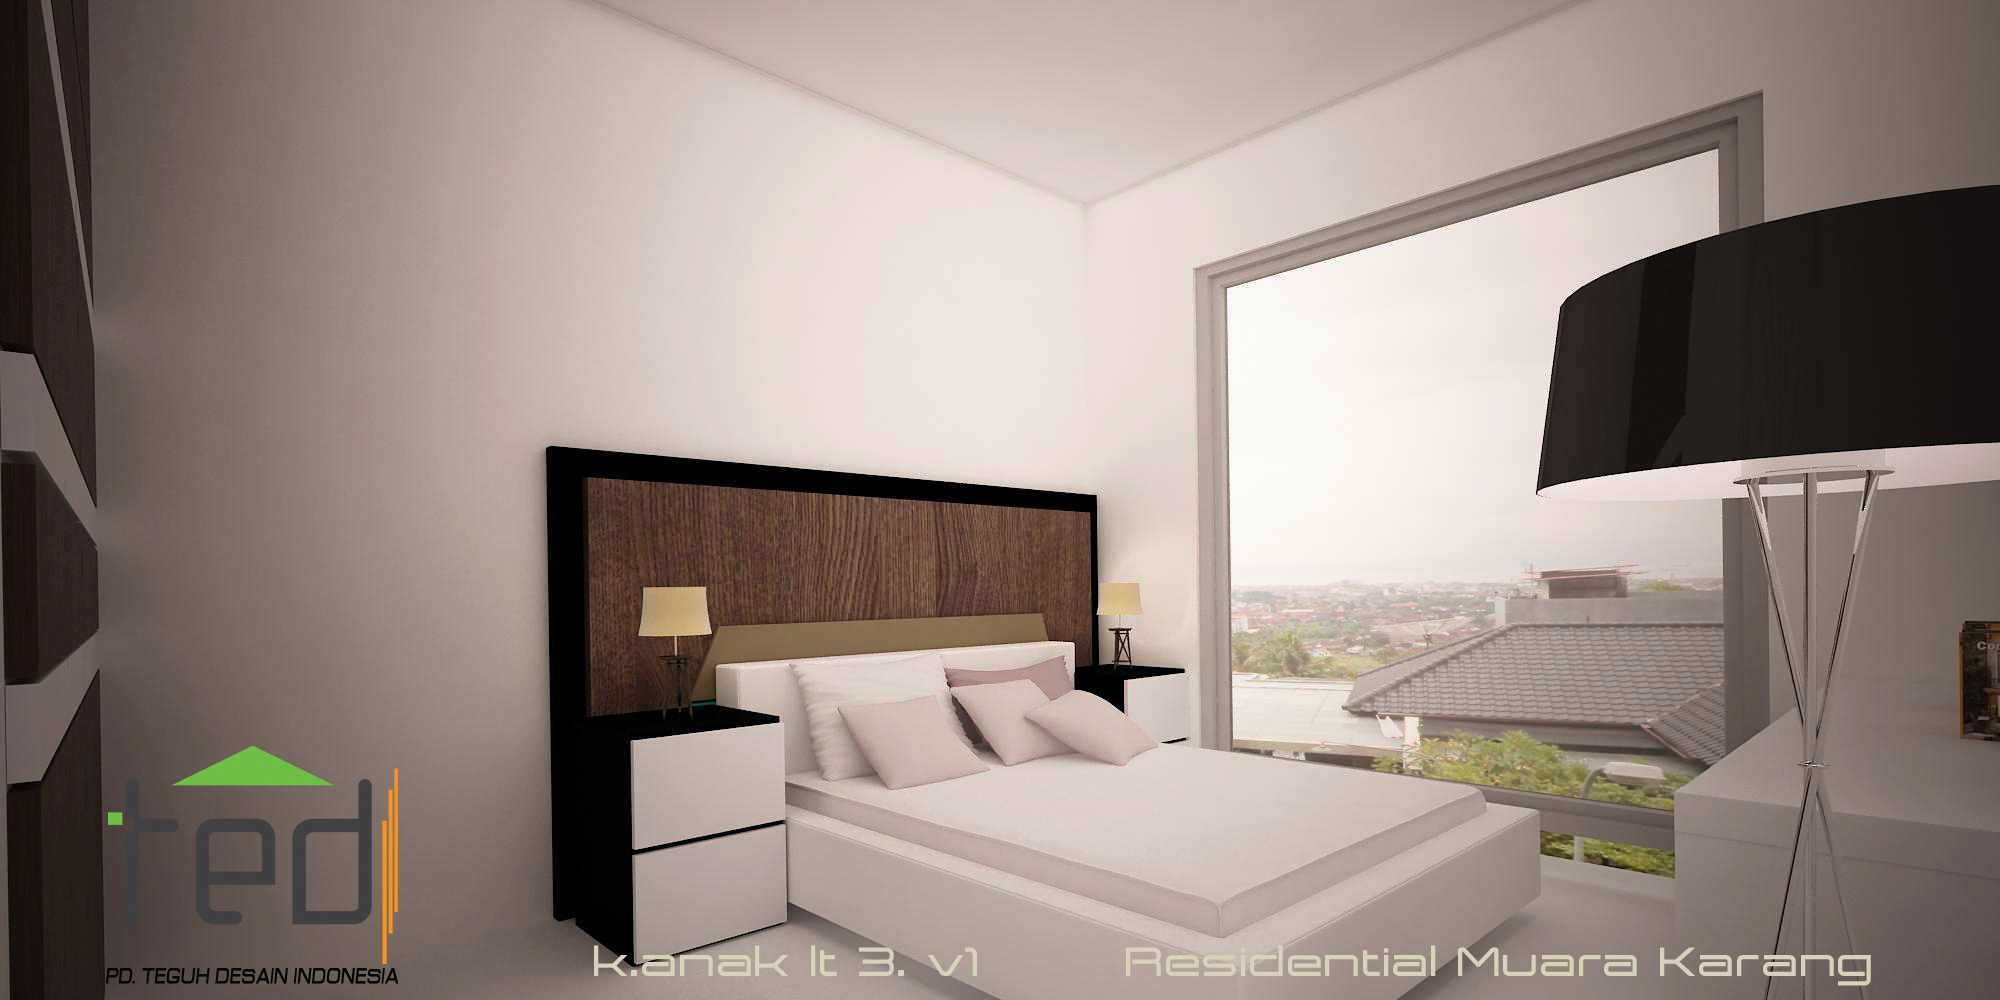 Pd Teguh Desain Indonesia Muara Karang Residence Jakarta, Indonesia Jakarta, Indonesia K Modern  35118